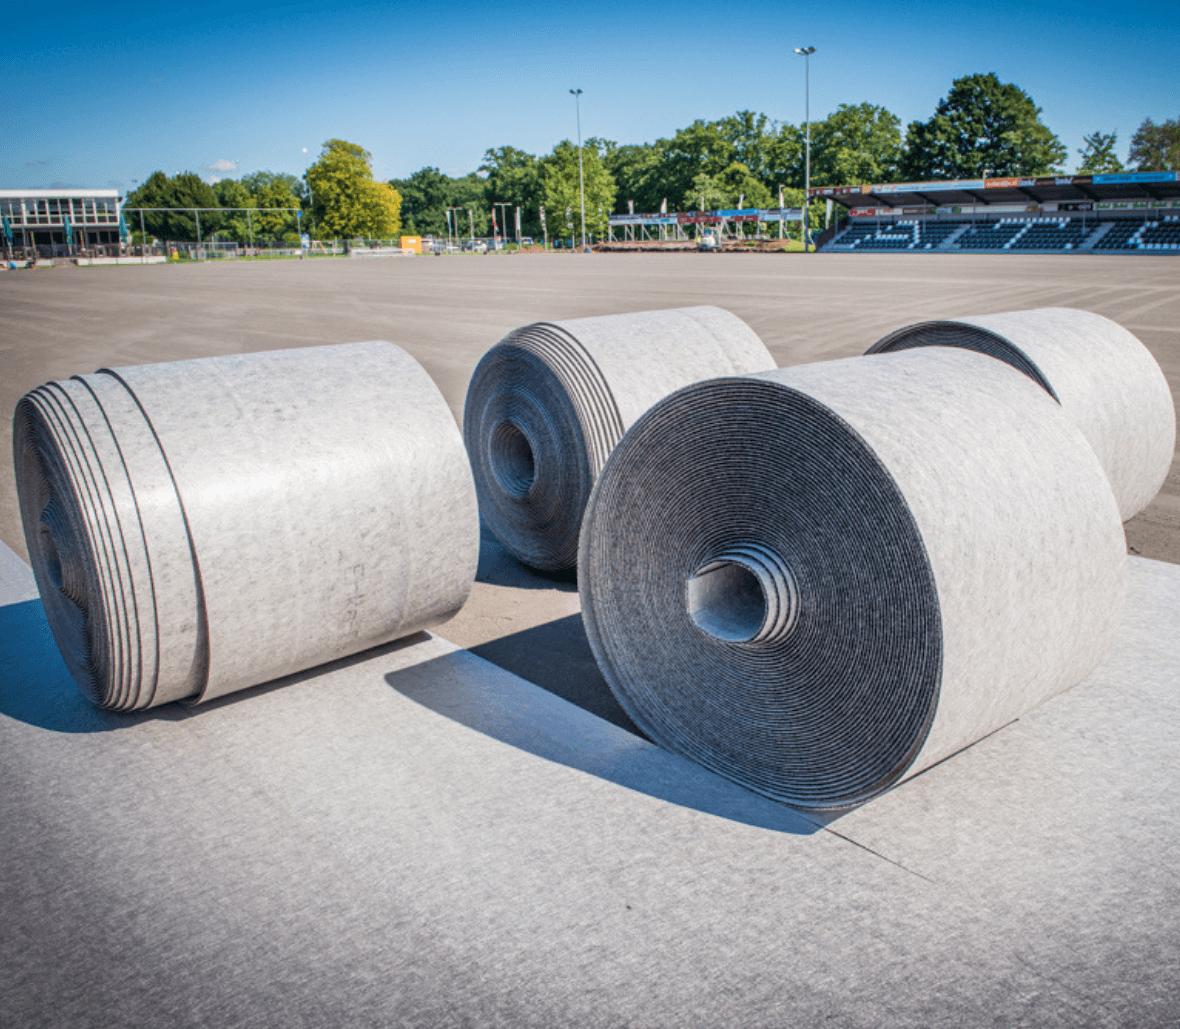 EnkaFlex_shockpad & drainage system for sportsfields_copyrights Low & Bonar_Enka Solutions (3)